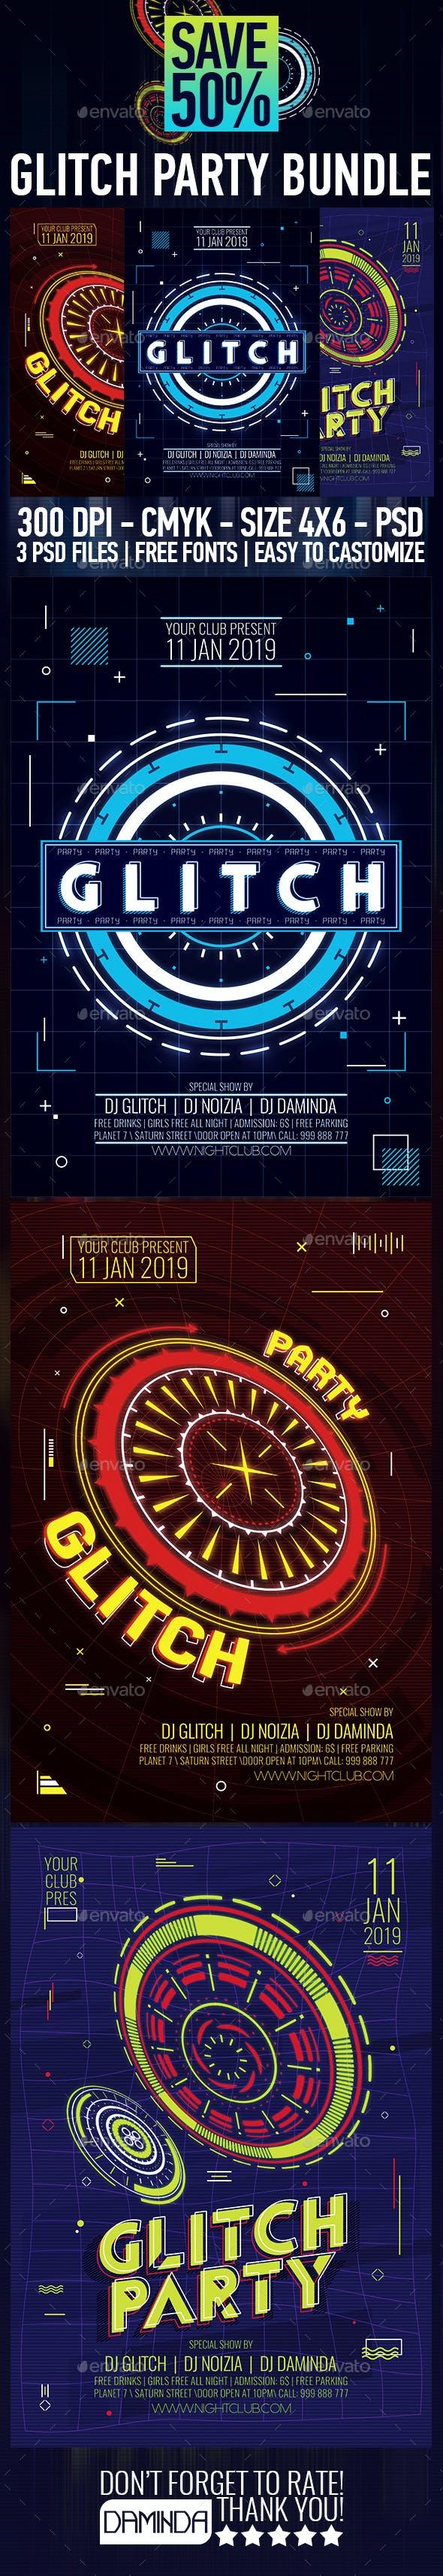 Glitch Party Bundle 2019